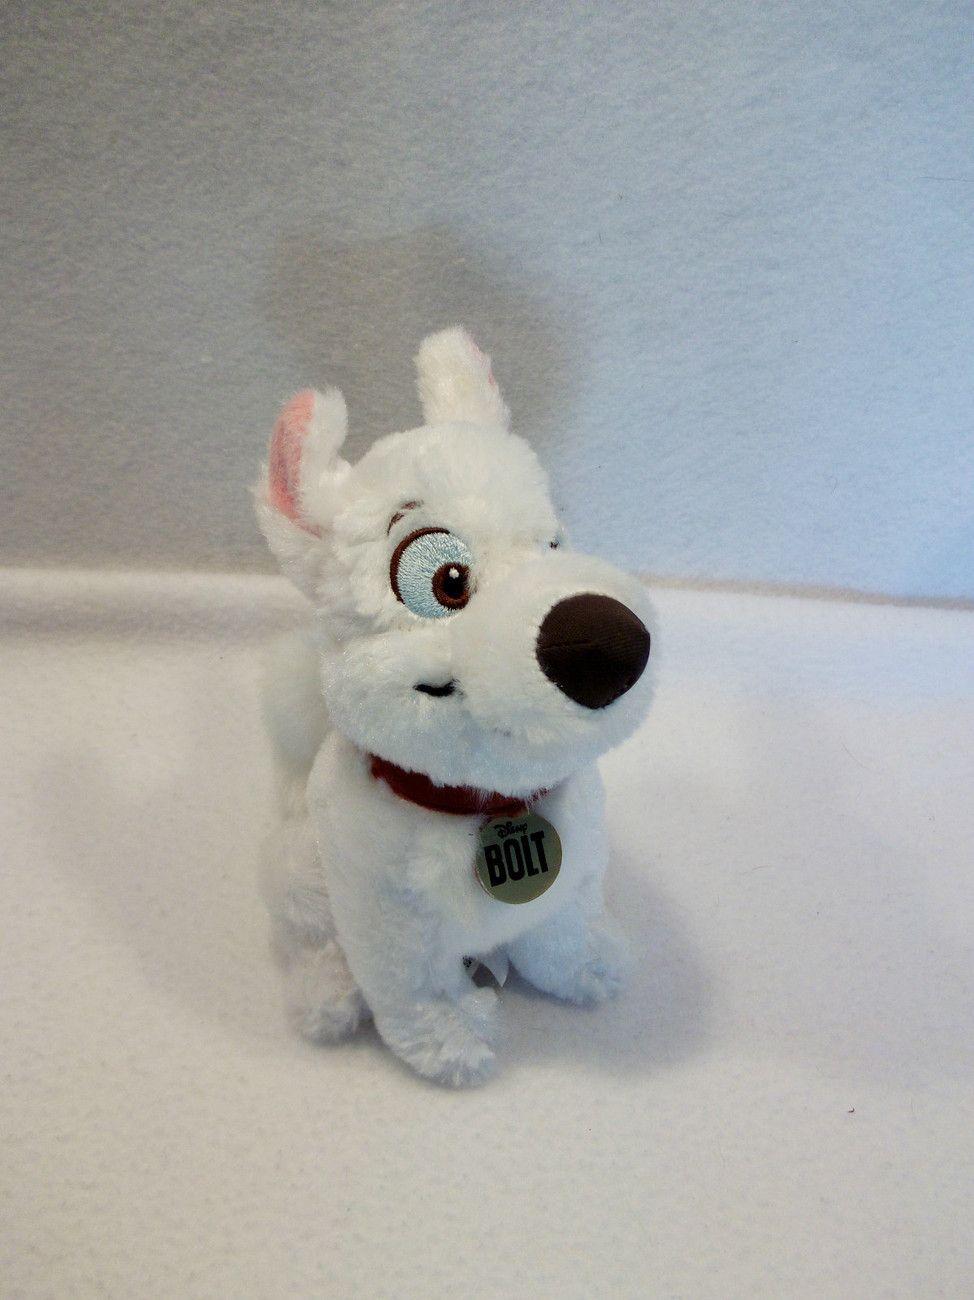 Walt Disney Bolt Super Dog Puppy 7 Plush Toy I Want This Me